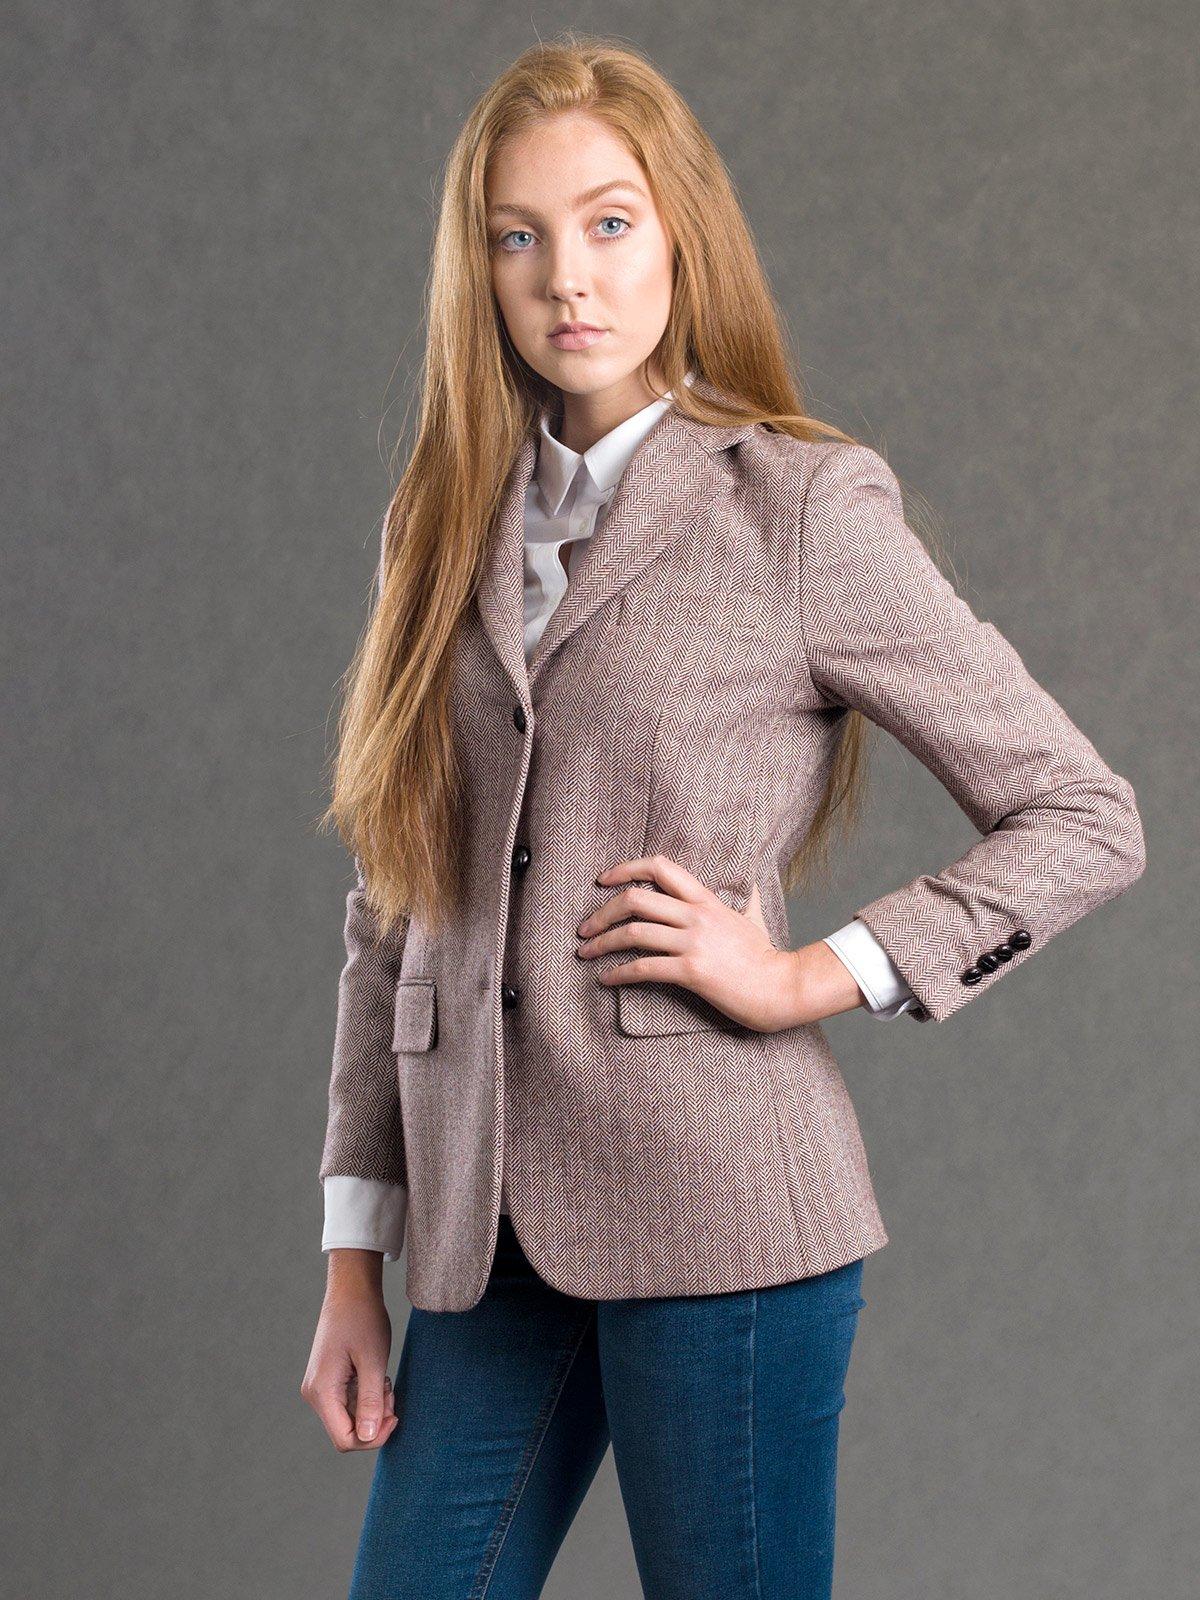 Tweed Blazers and Skirts 3